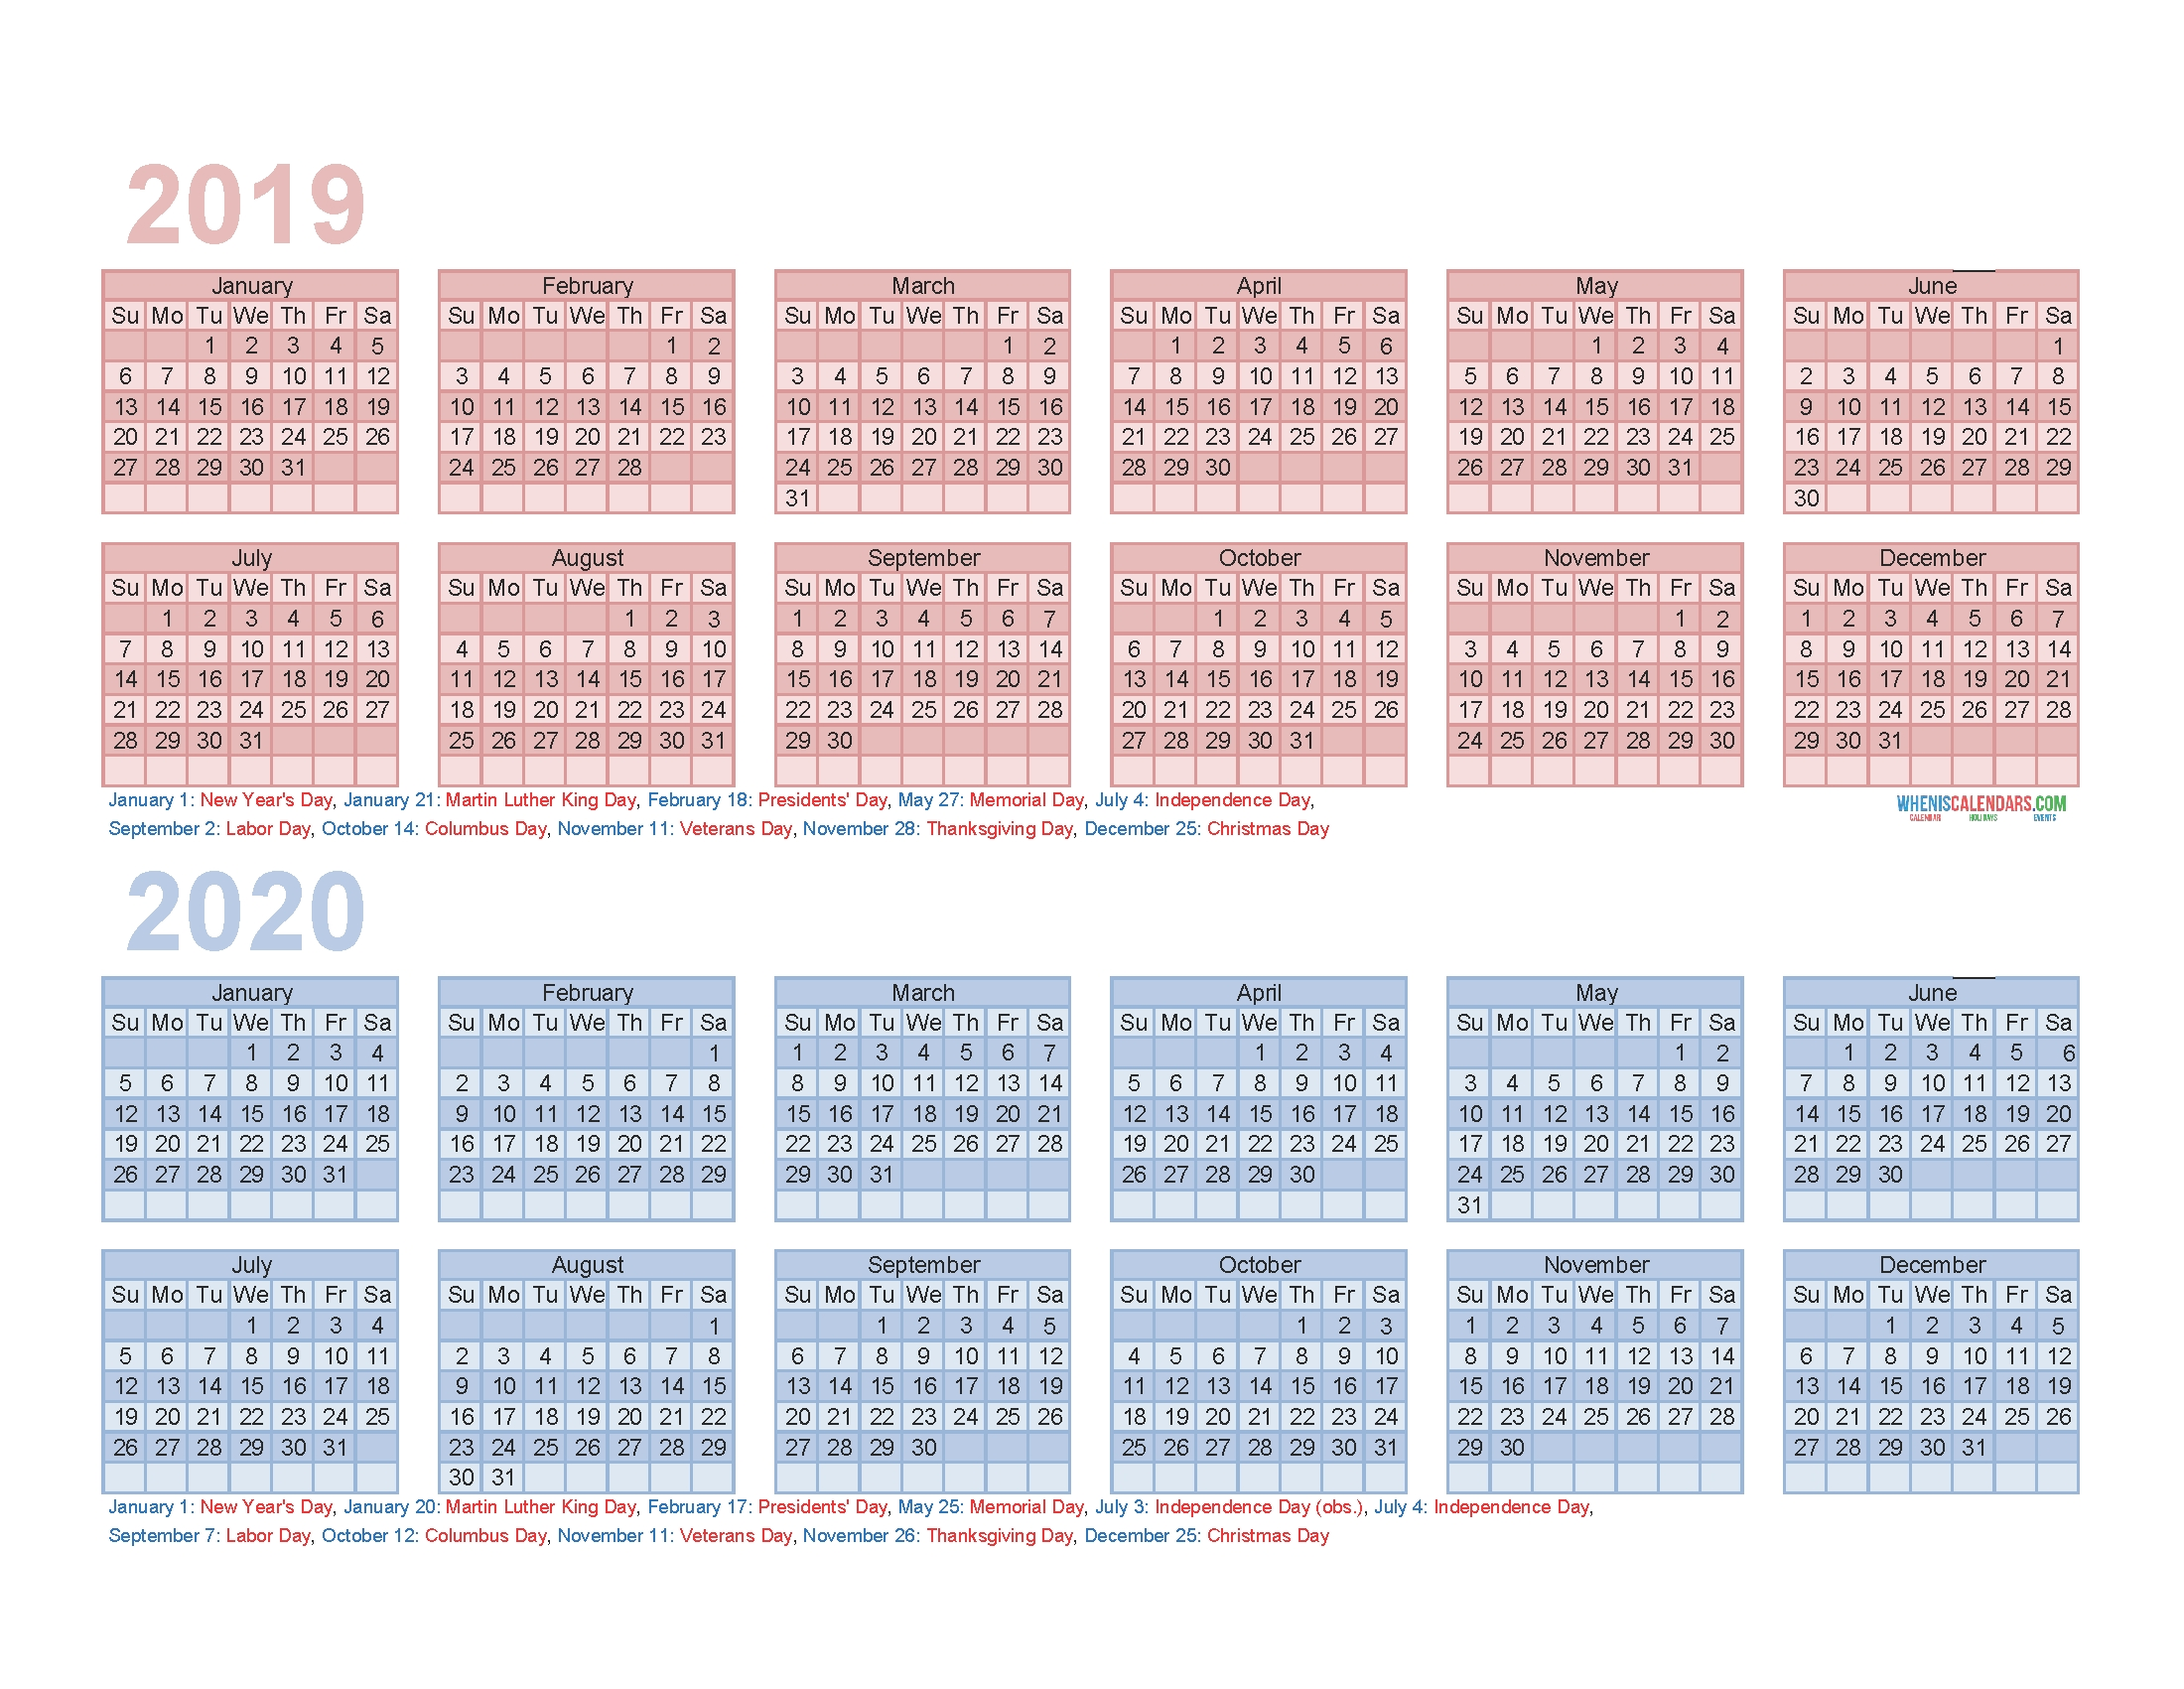 Print 2 Year Calendar | Ten Free Printable Calendar 2020-2021